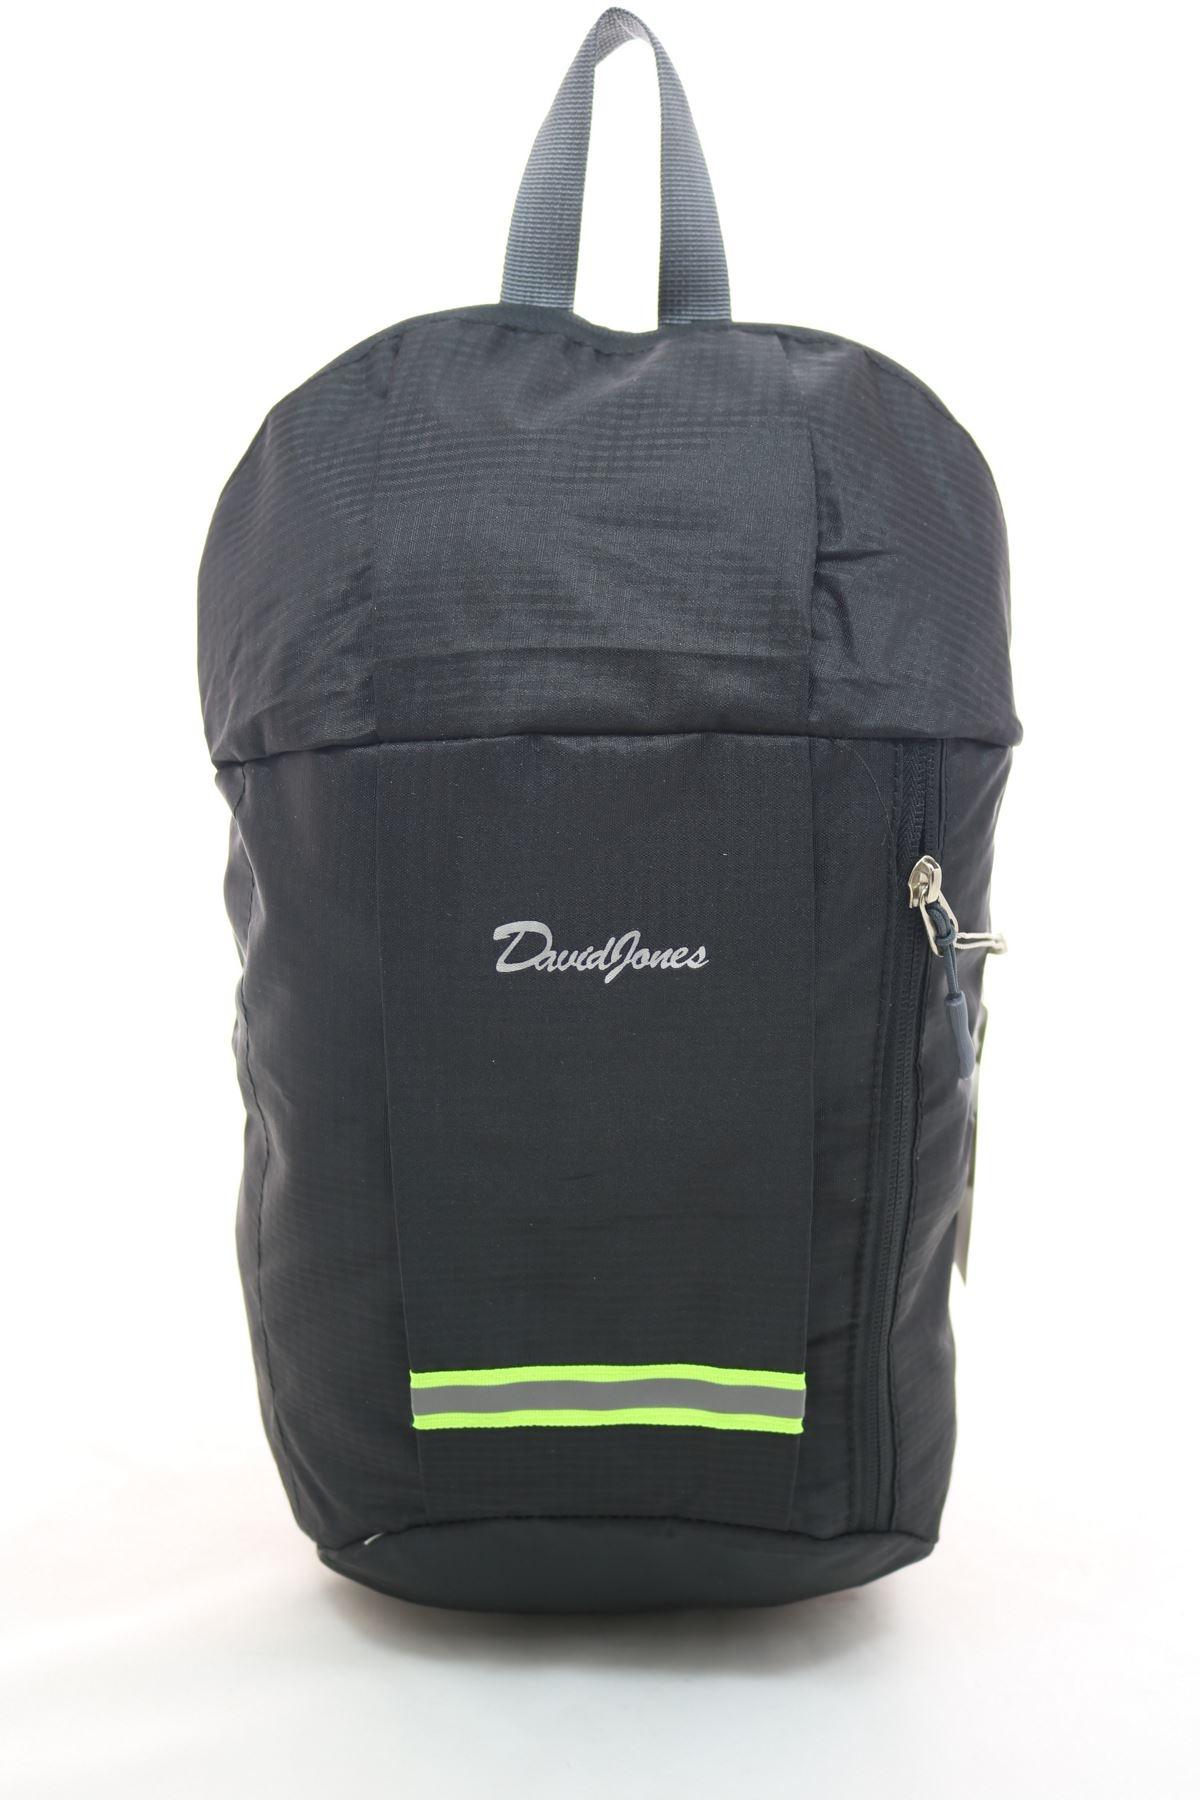 Рюкзак David Jones 5209 оптом